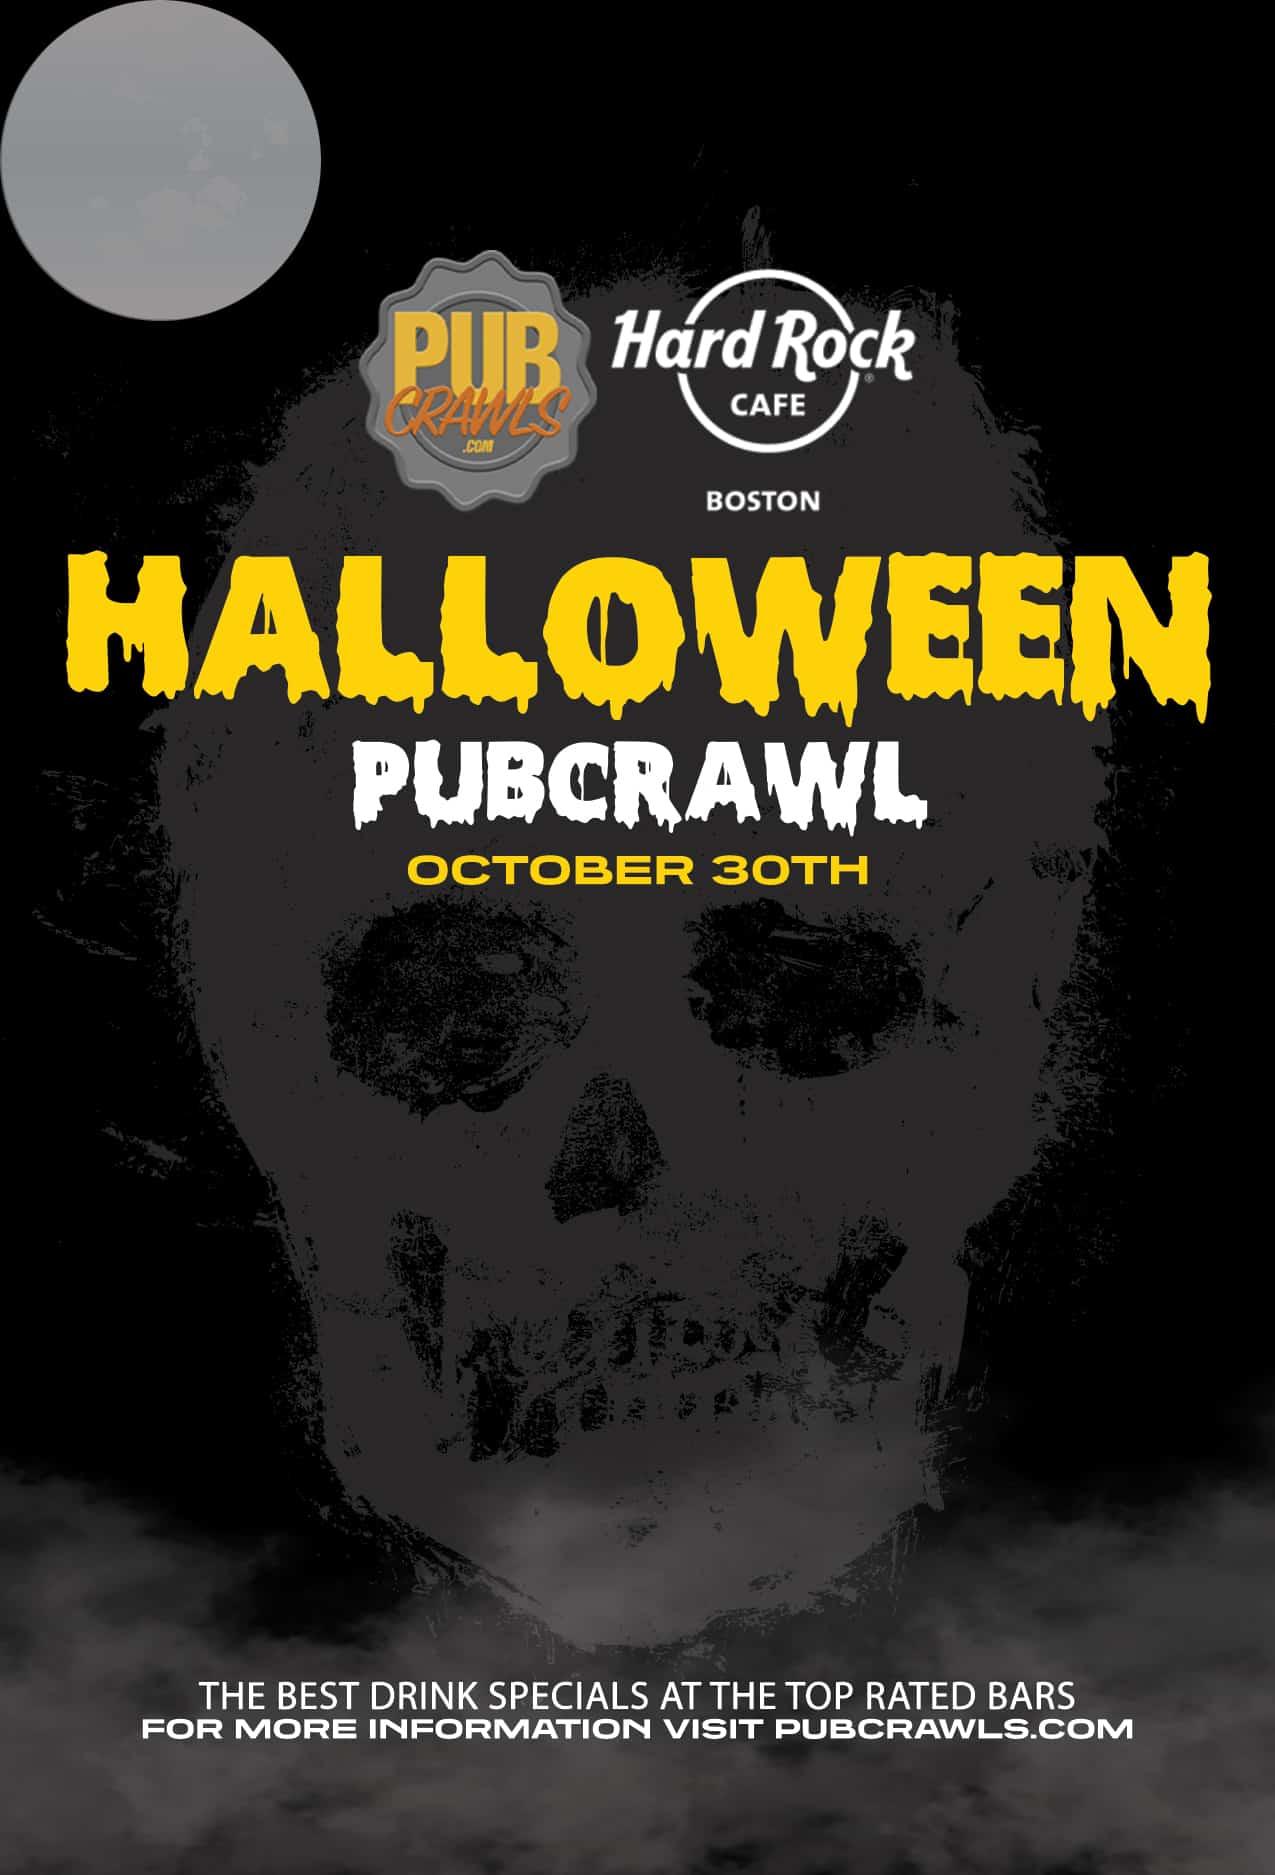 Philadelphia Halloween Fright Night Pub Crawl